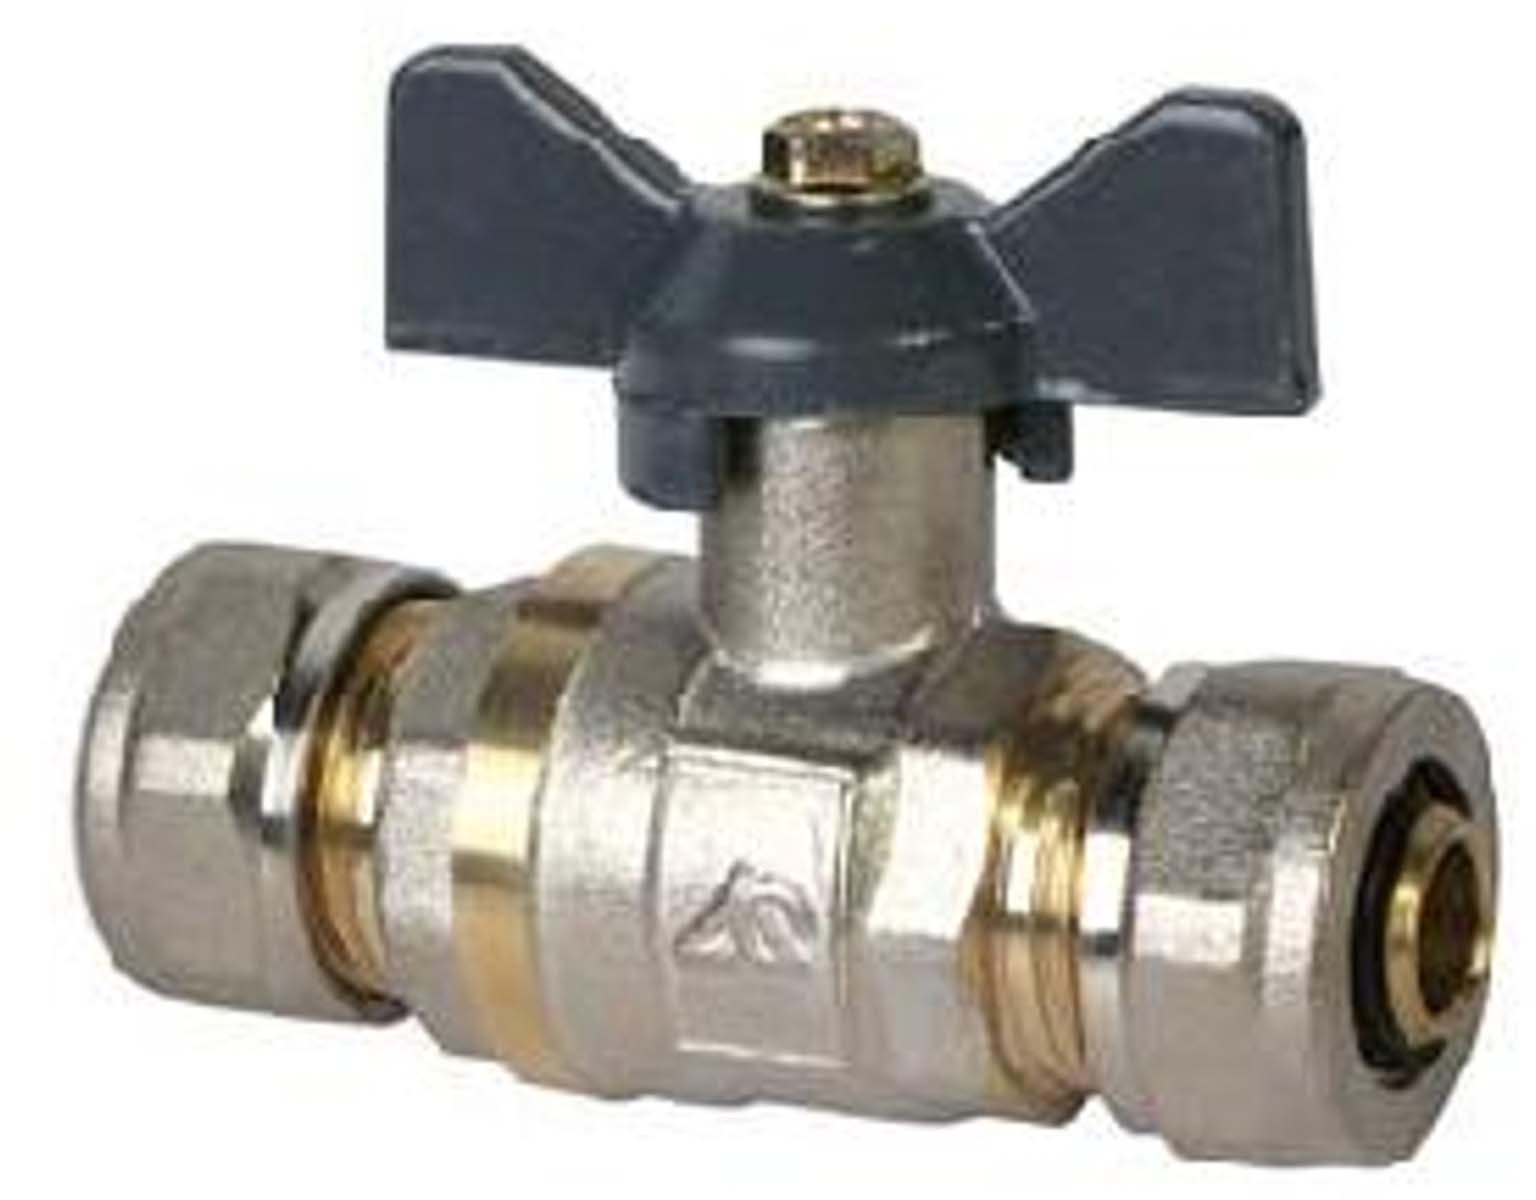 Кран шаровый RVC, под металлическую/пластиковую трубу, 20 х 3/4 ц/ш бант, MP-У кран шаровый для металлопластиковых труб 16 обж ц х 16 обж ц бабочка